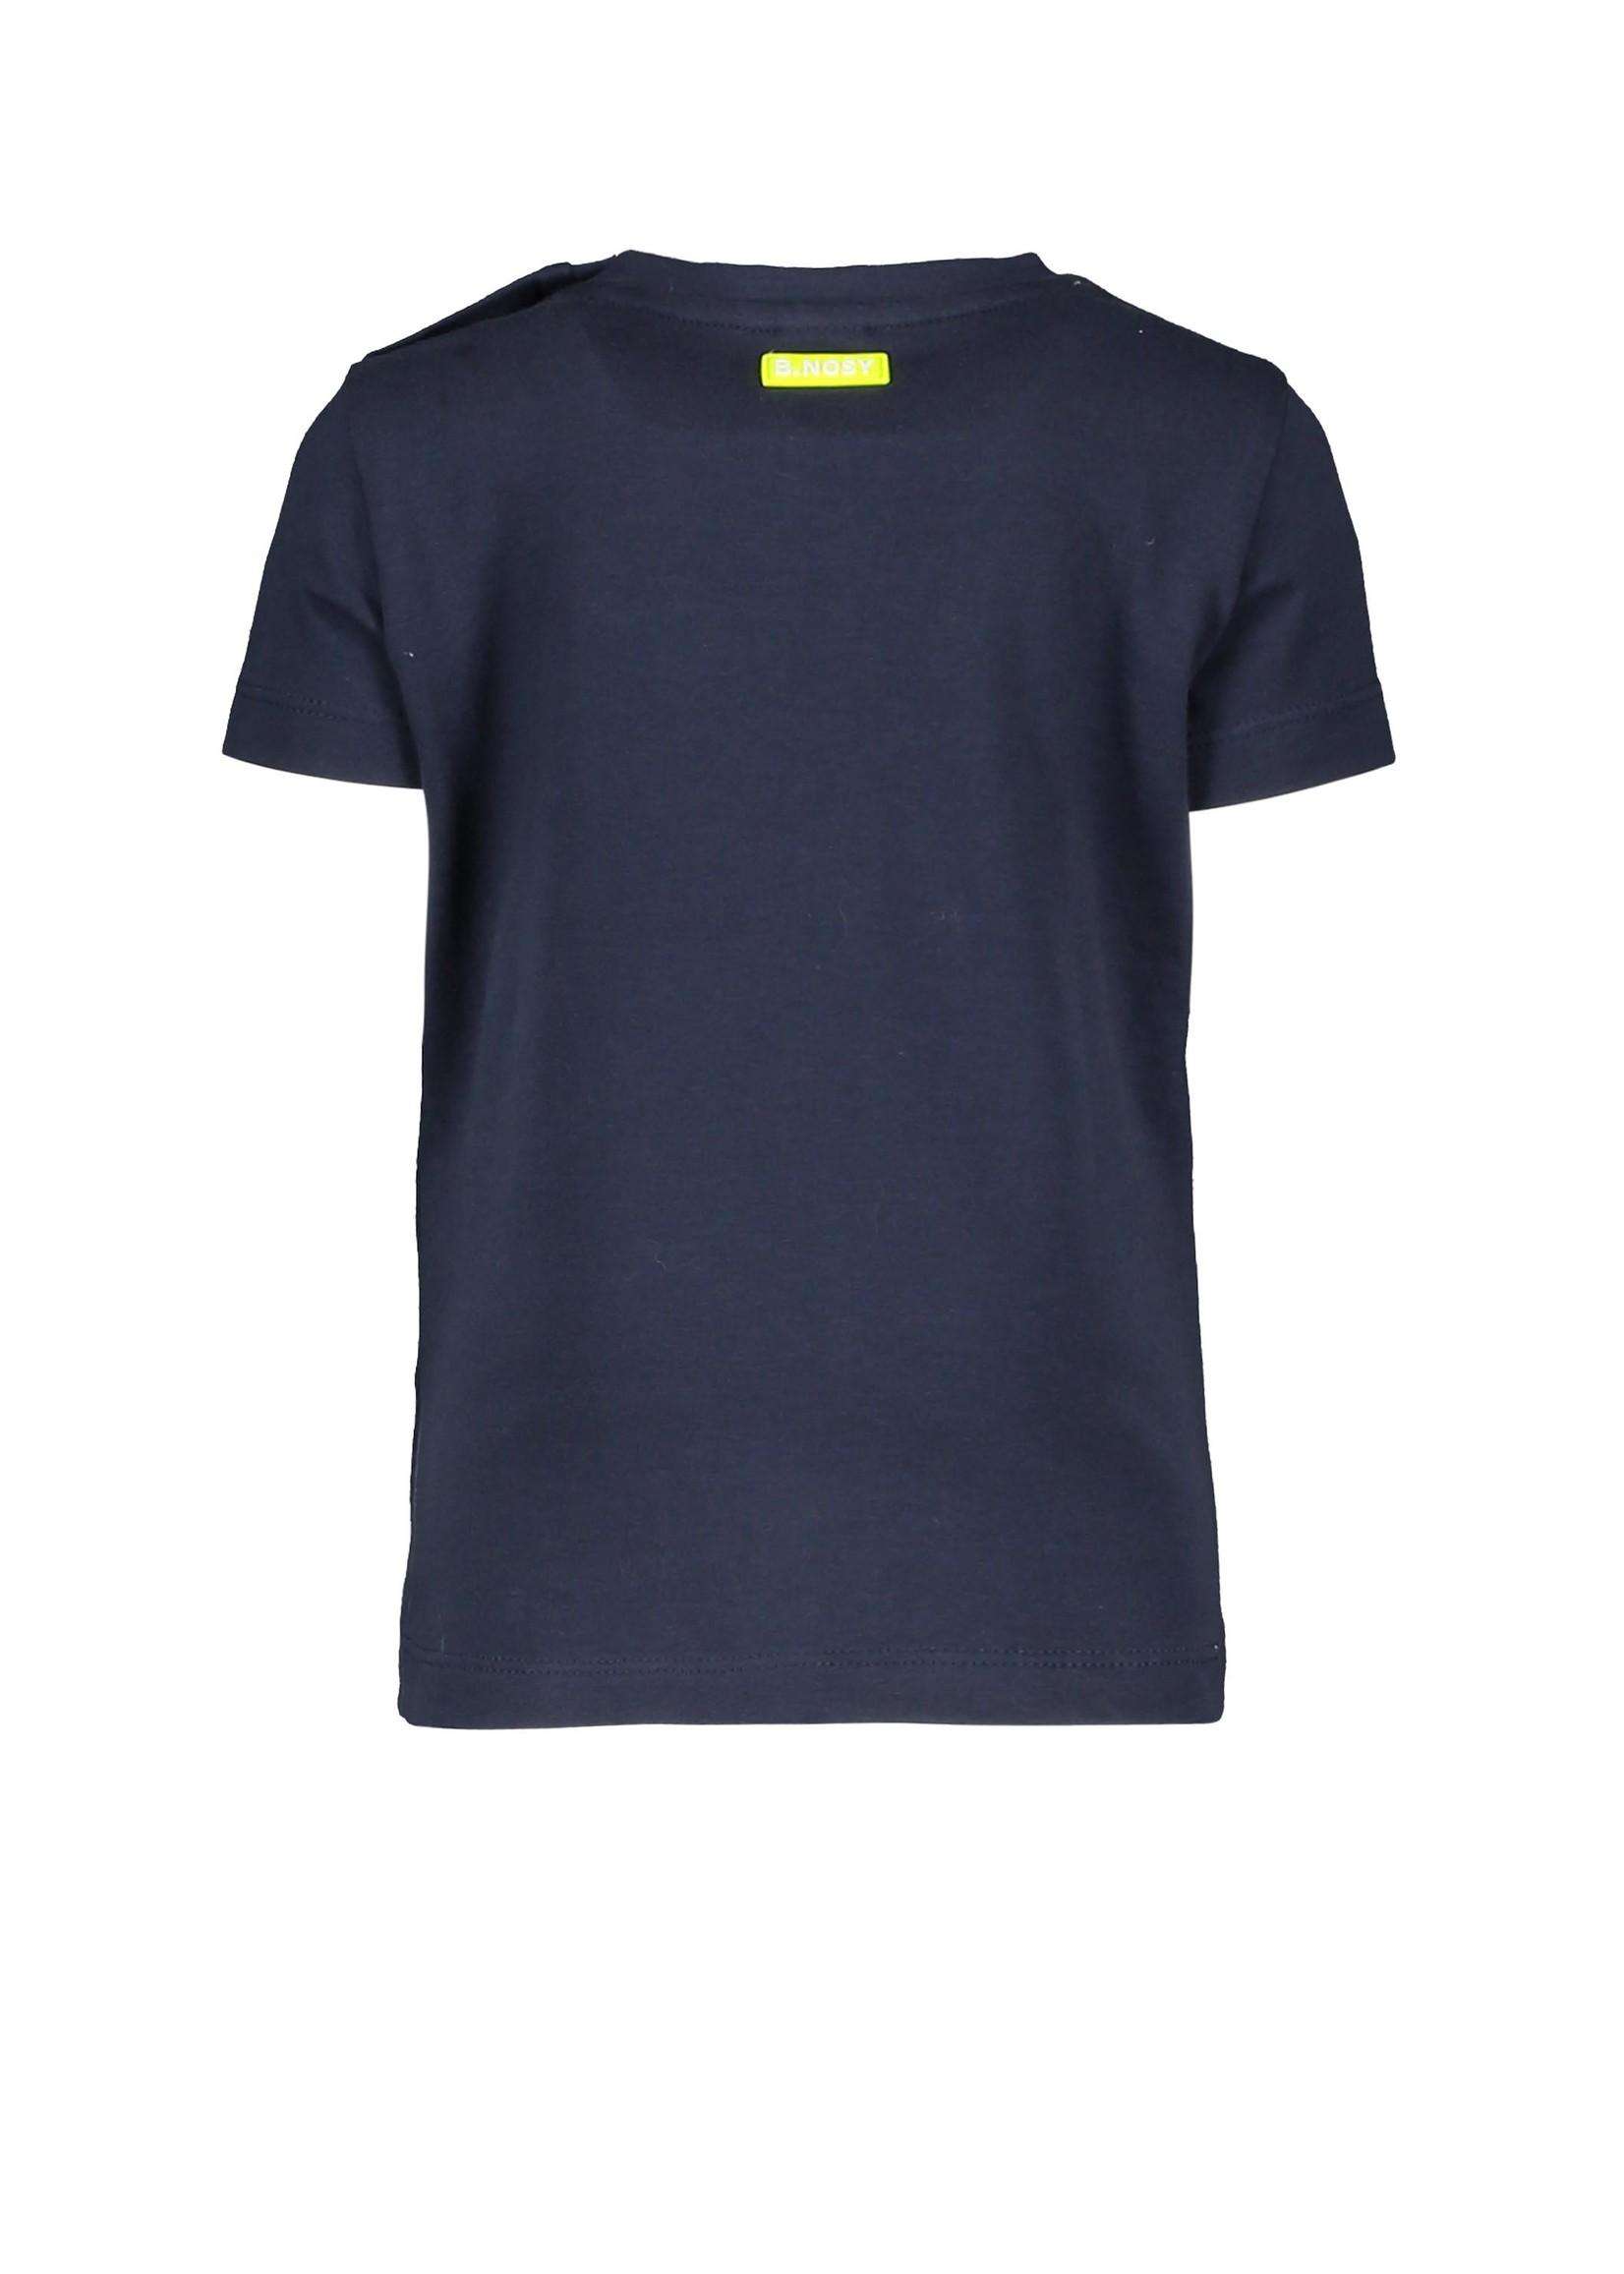 B.nosy Shirt Oxford Blue